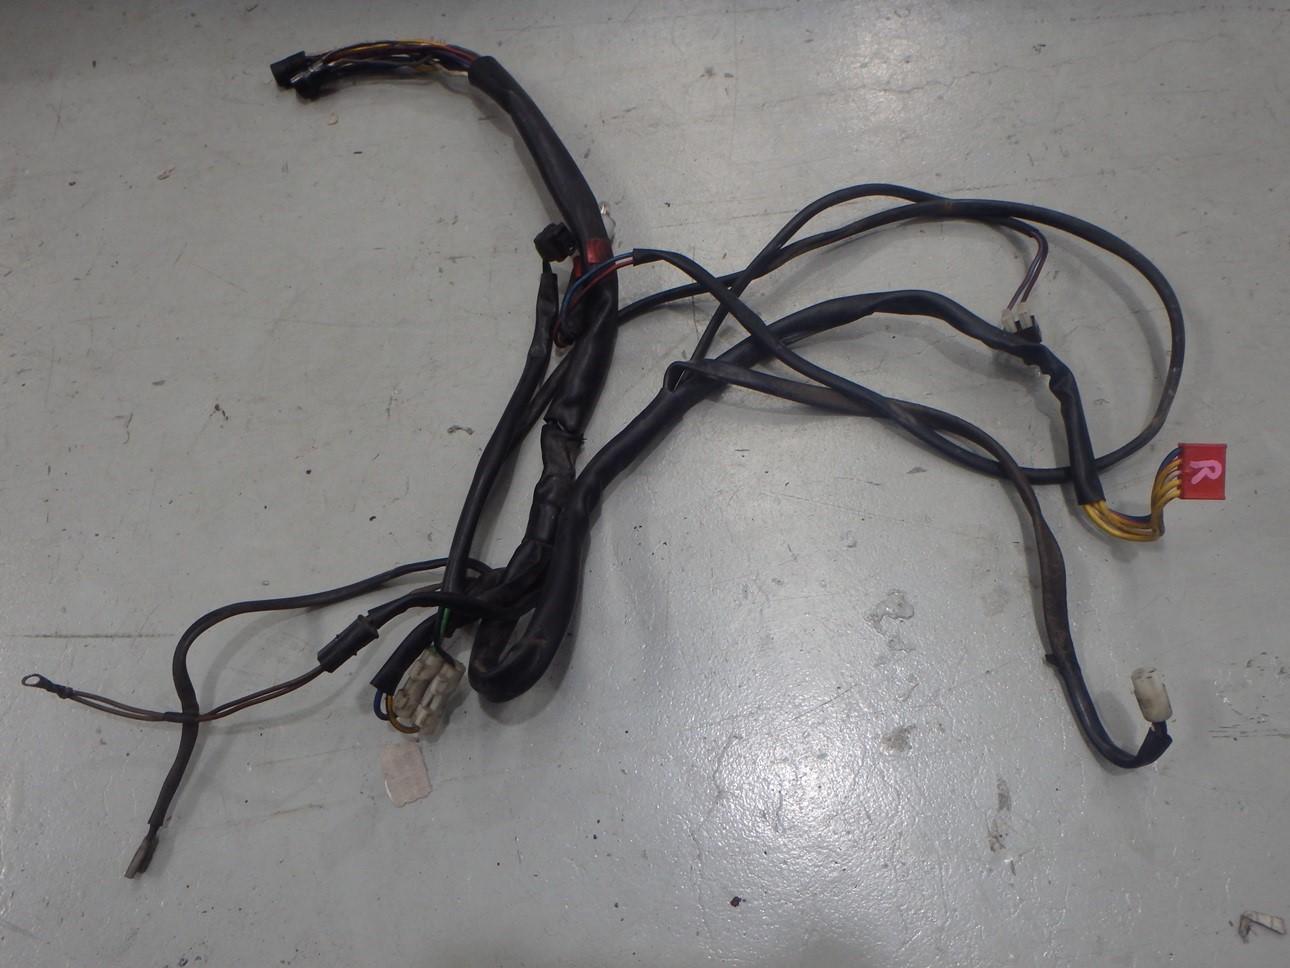 Admirable Ferrari 328 Gts Door Wiring Loom Harness Cables Rhs Lhd J082 Ebay Wiring 101 Capemaxxcnl